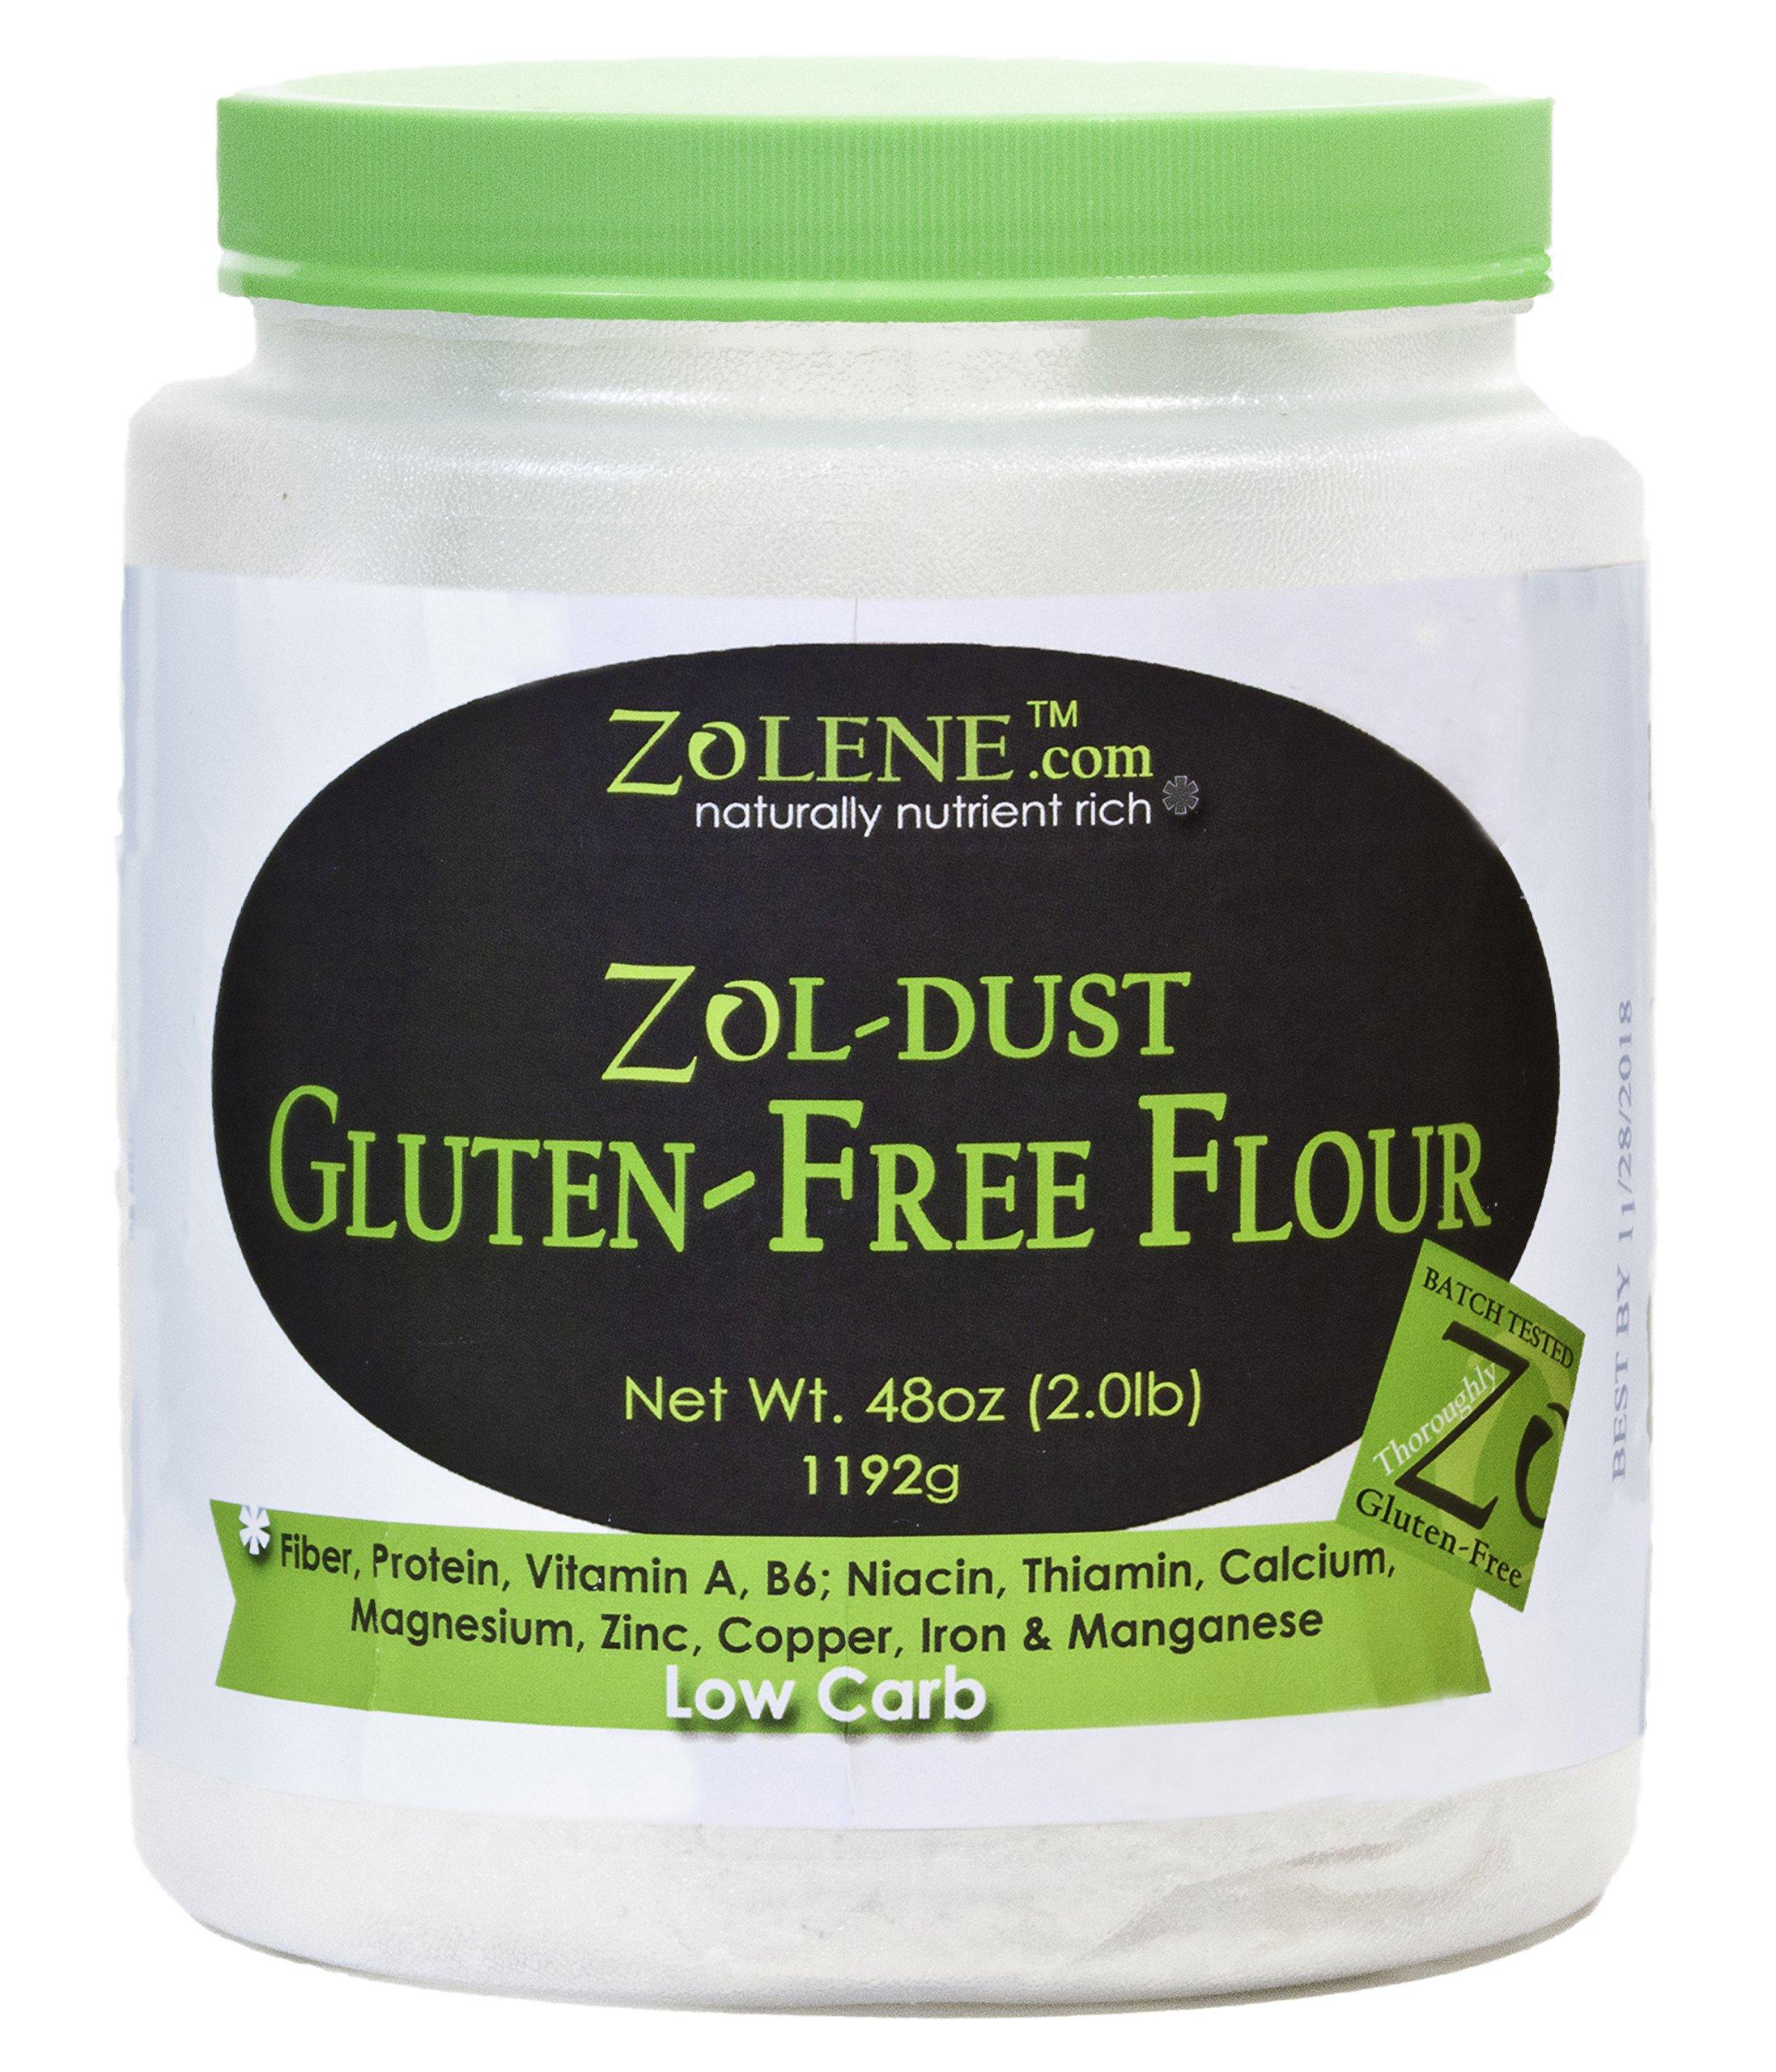 Zol-DUST Gluten-Free All Purpose Flour, gluten free flour blend, gluten free flour for baking, gluten free flour 1 to 1, gluten free flour mix, gluten free flour low carb, gluten free flour no rice